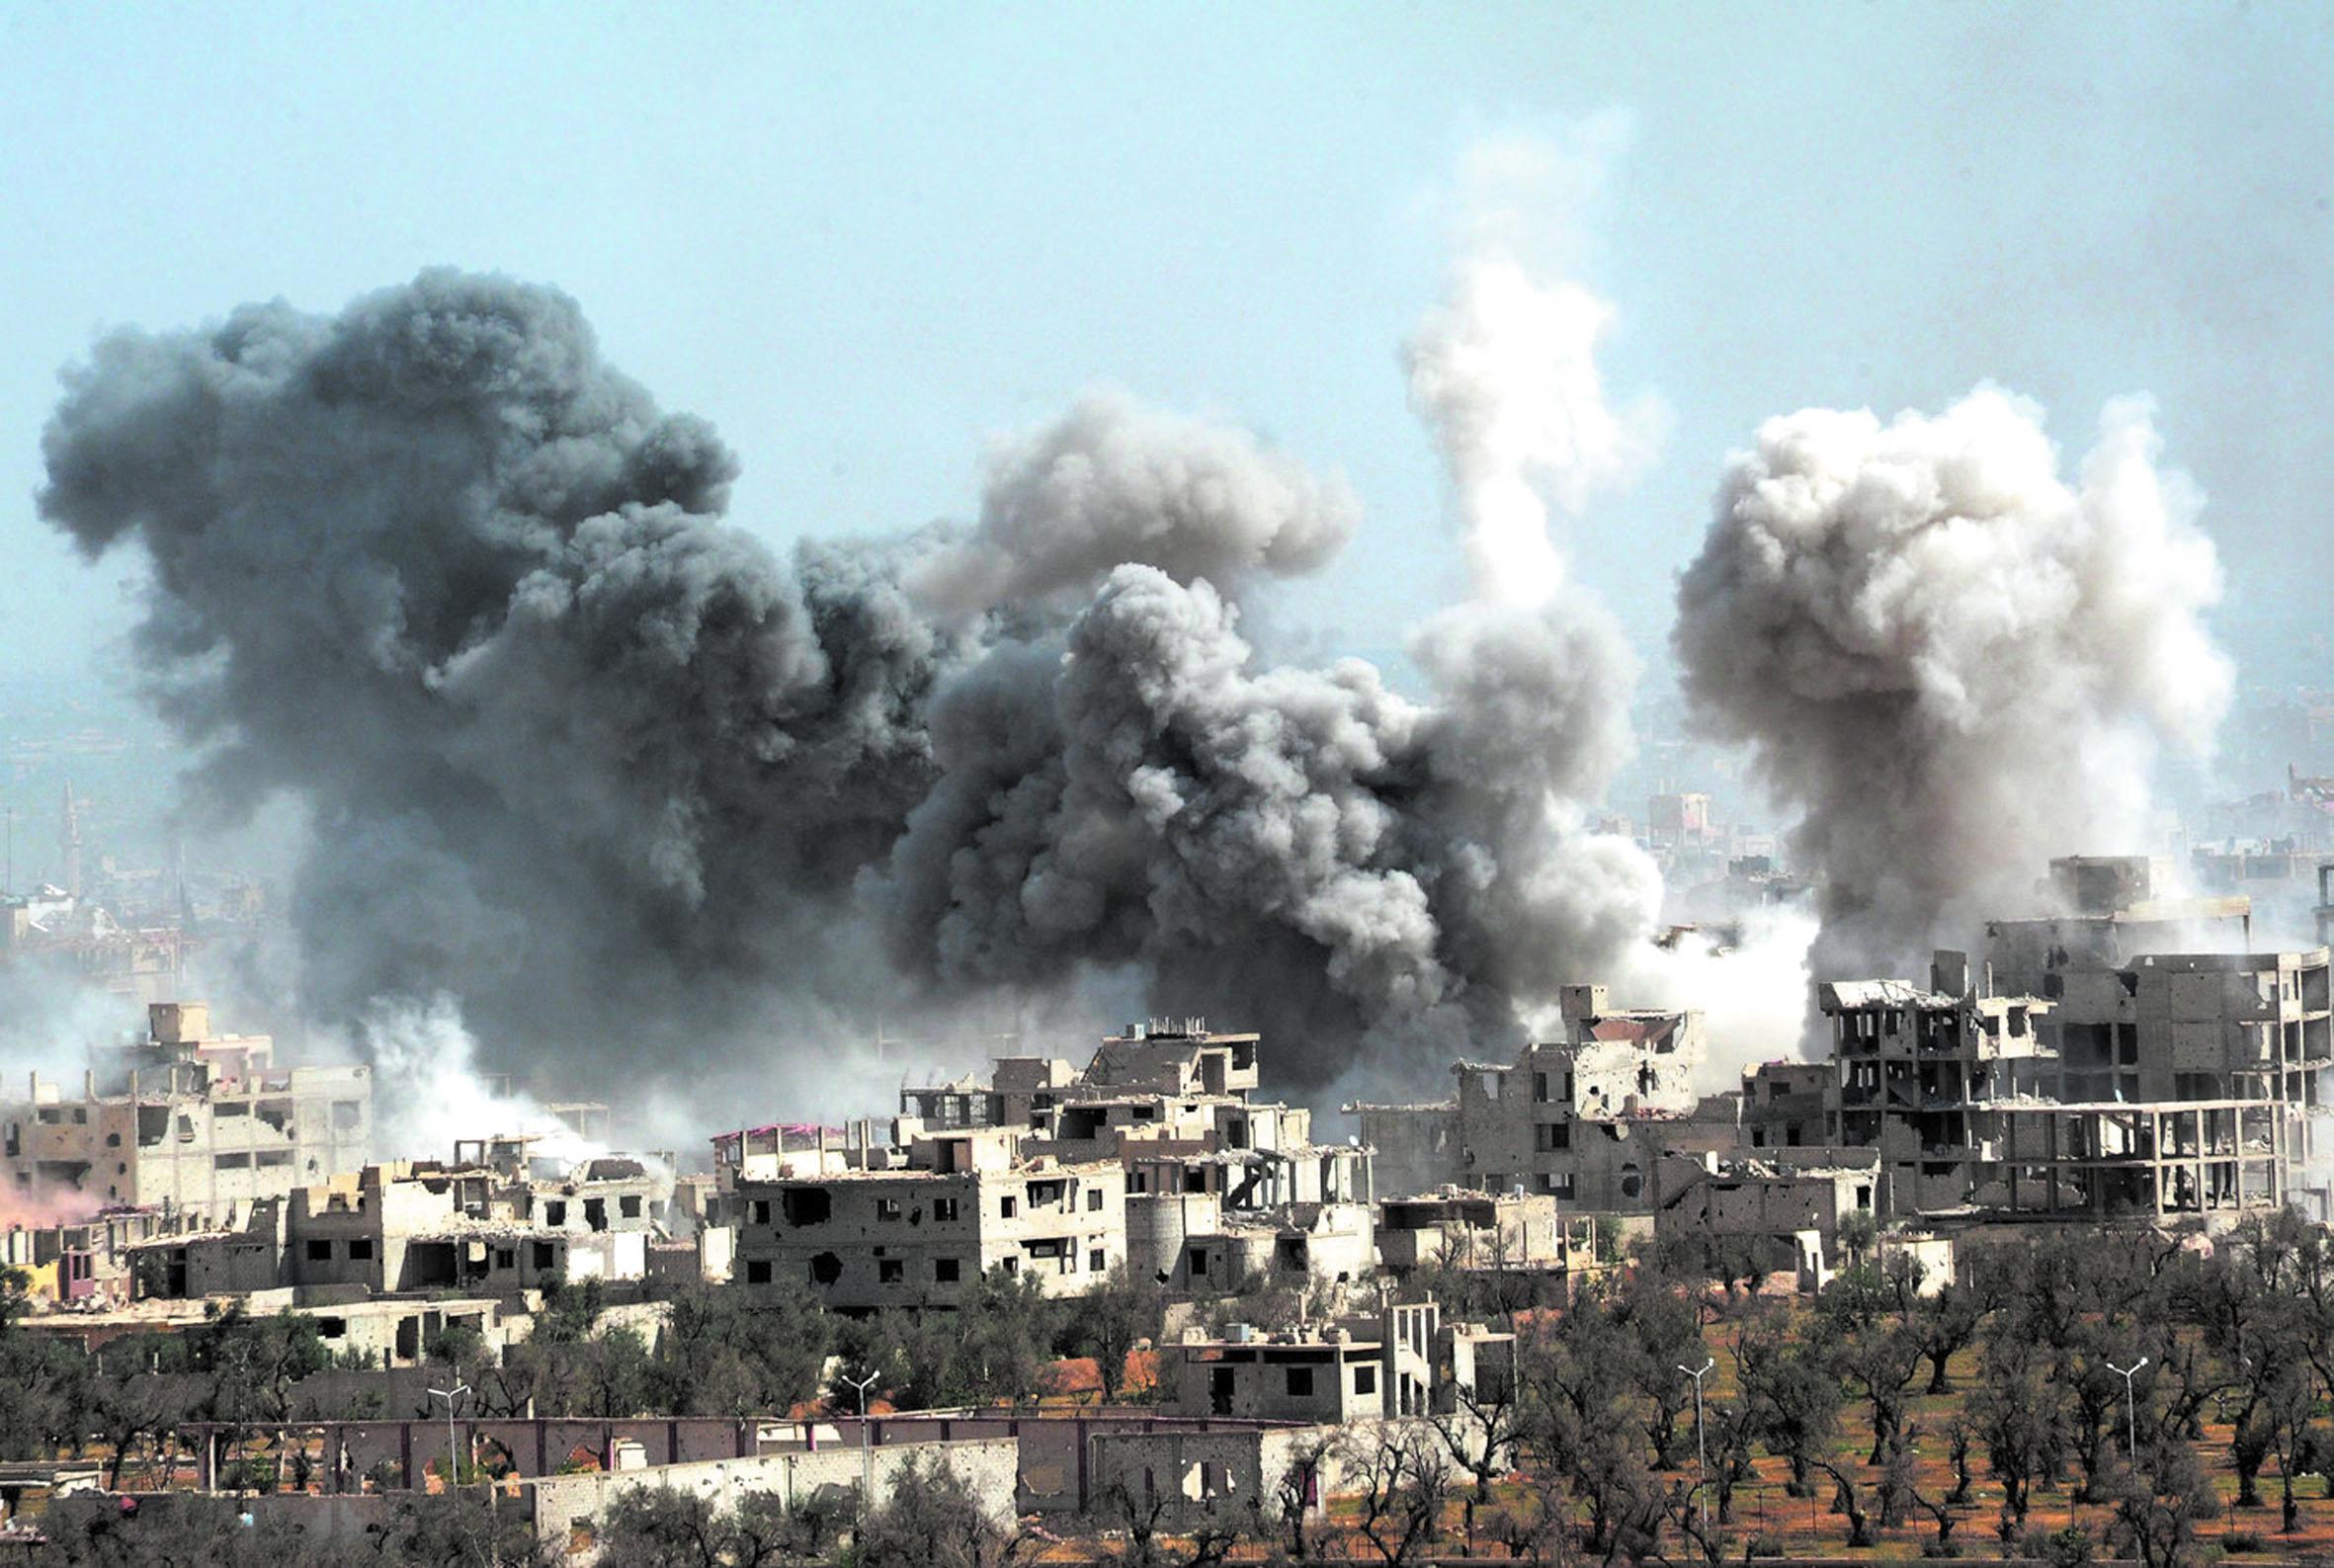 Déluge de feu sur les zones rebelles de Deraa